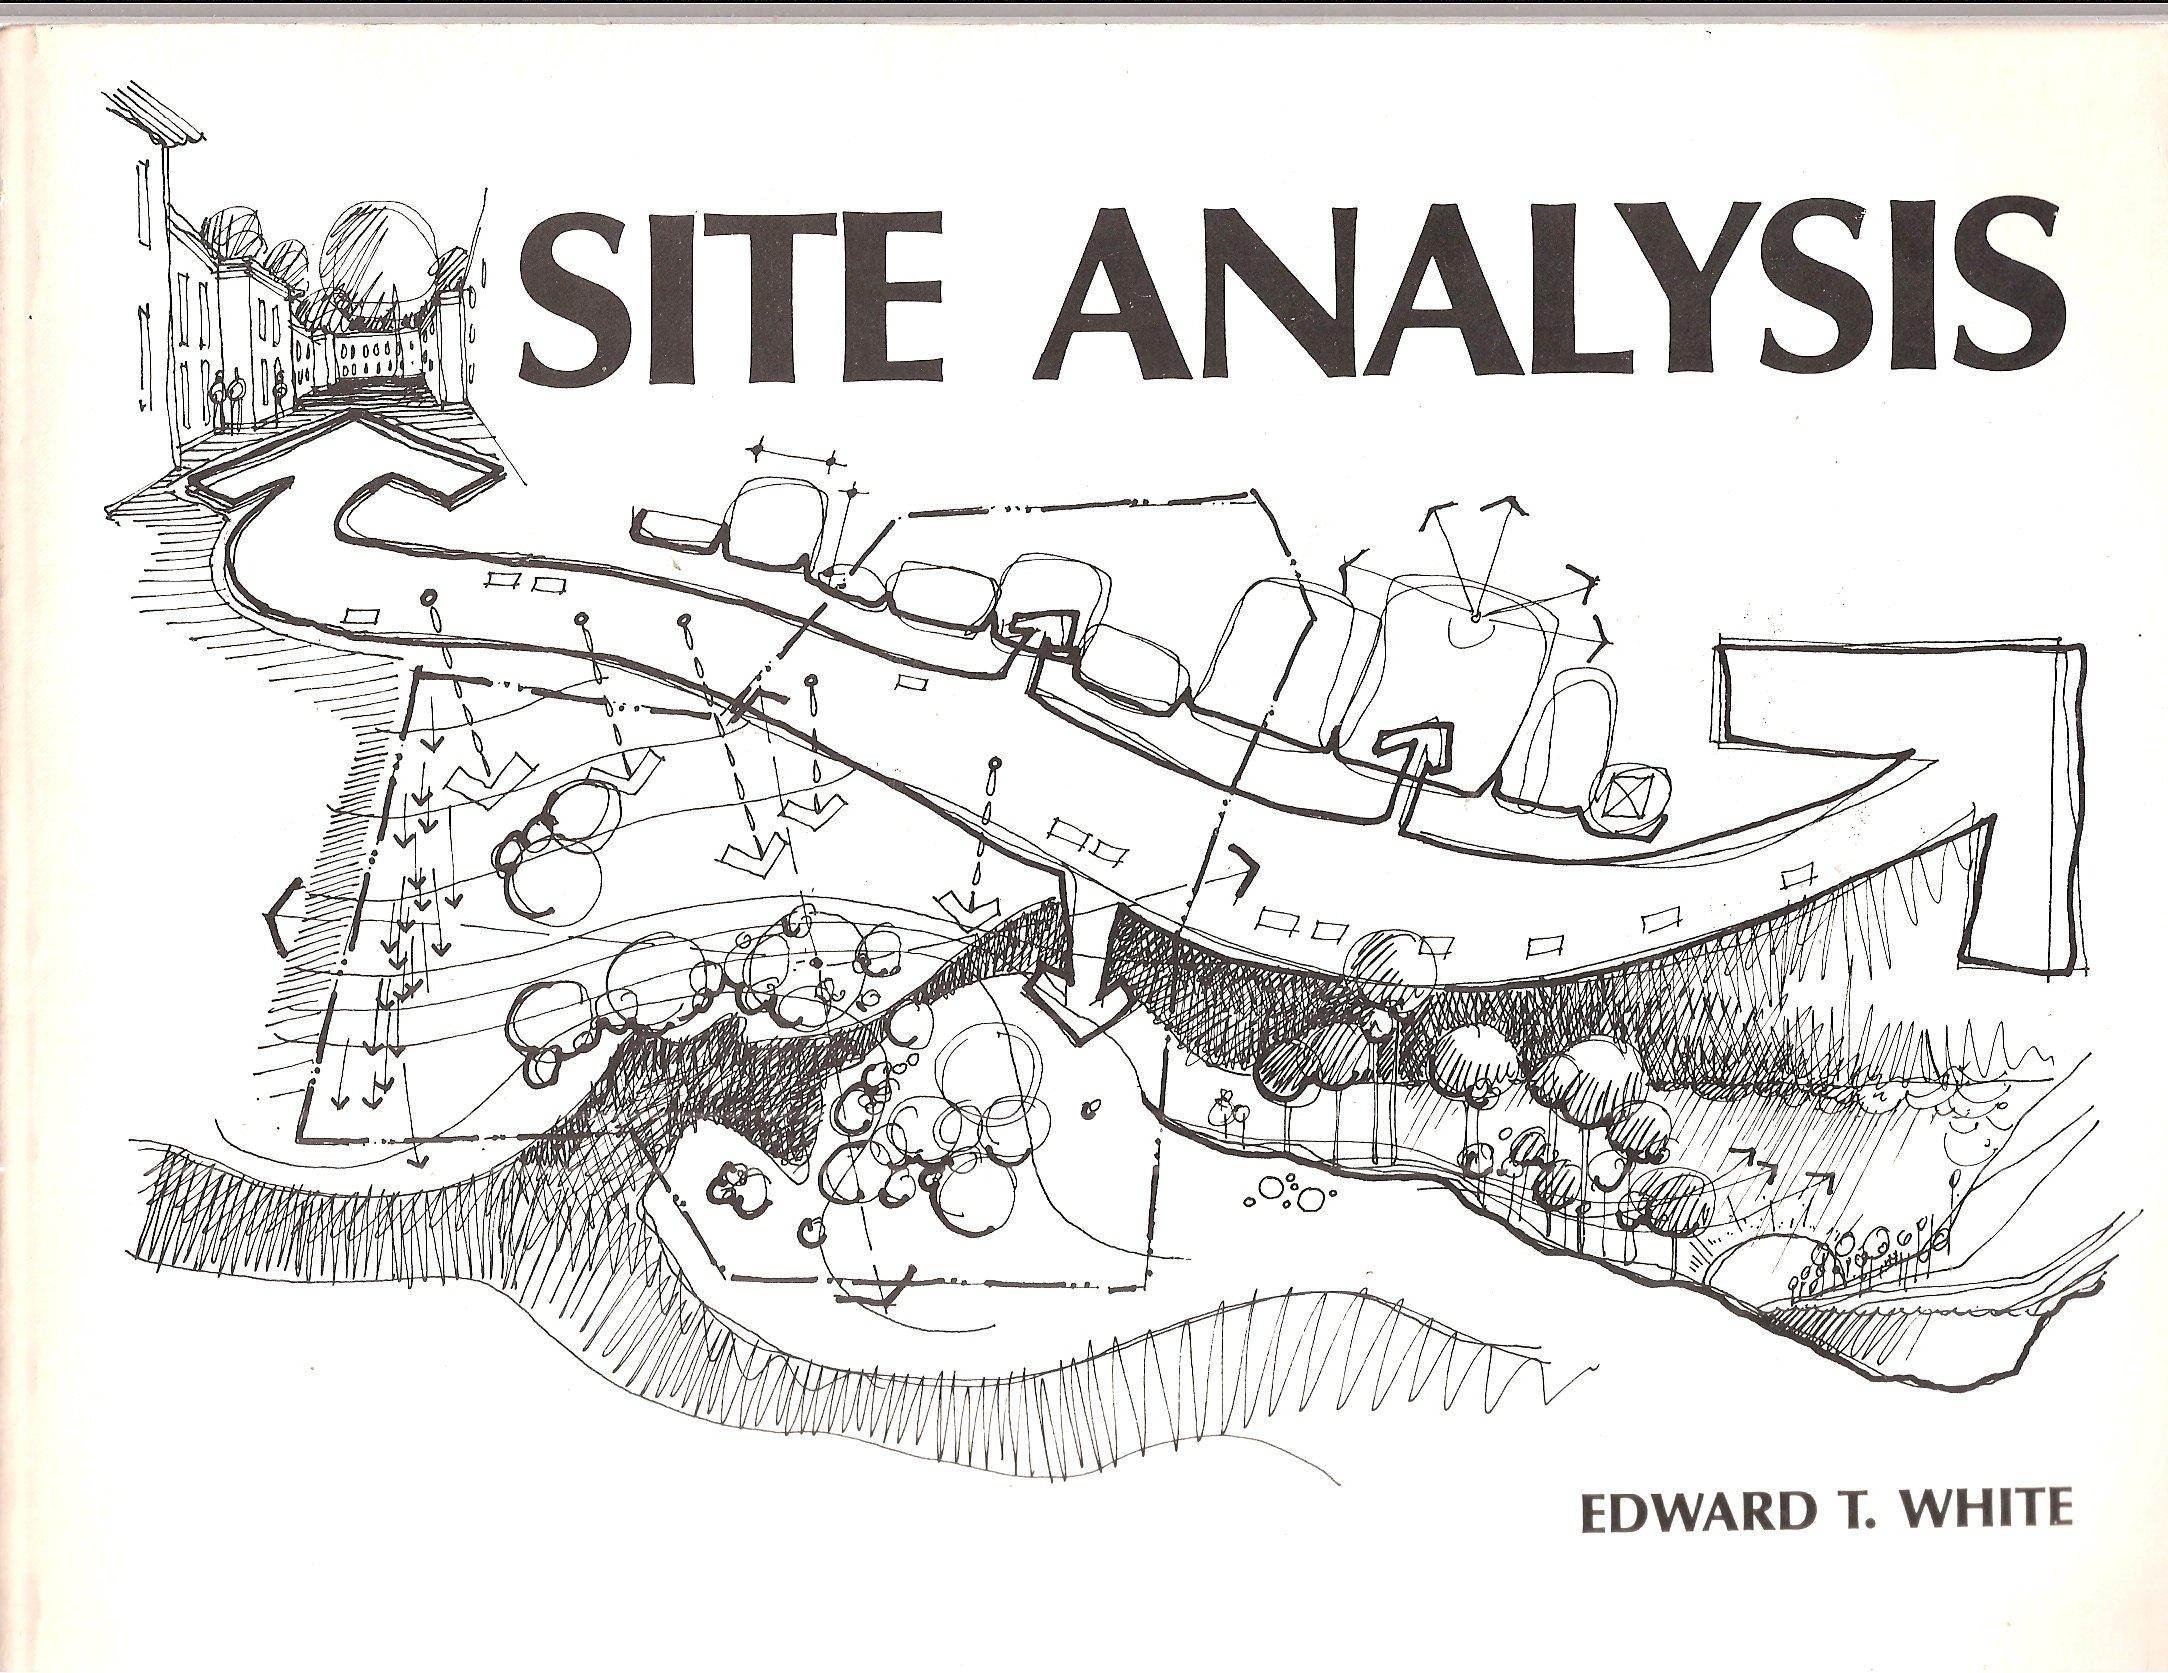 Thesis Analysis